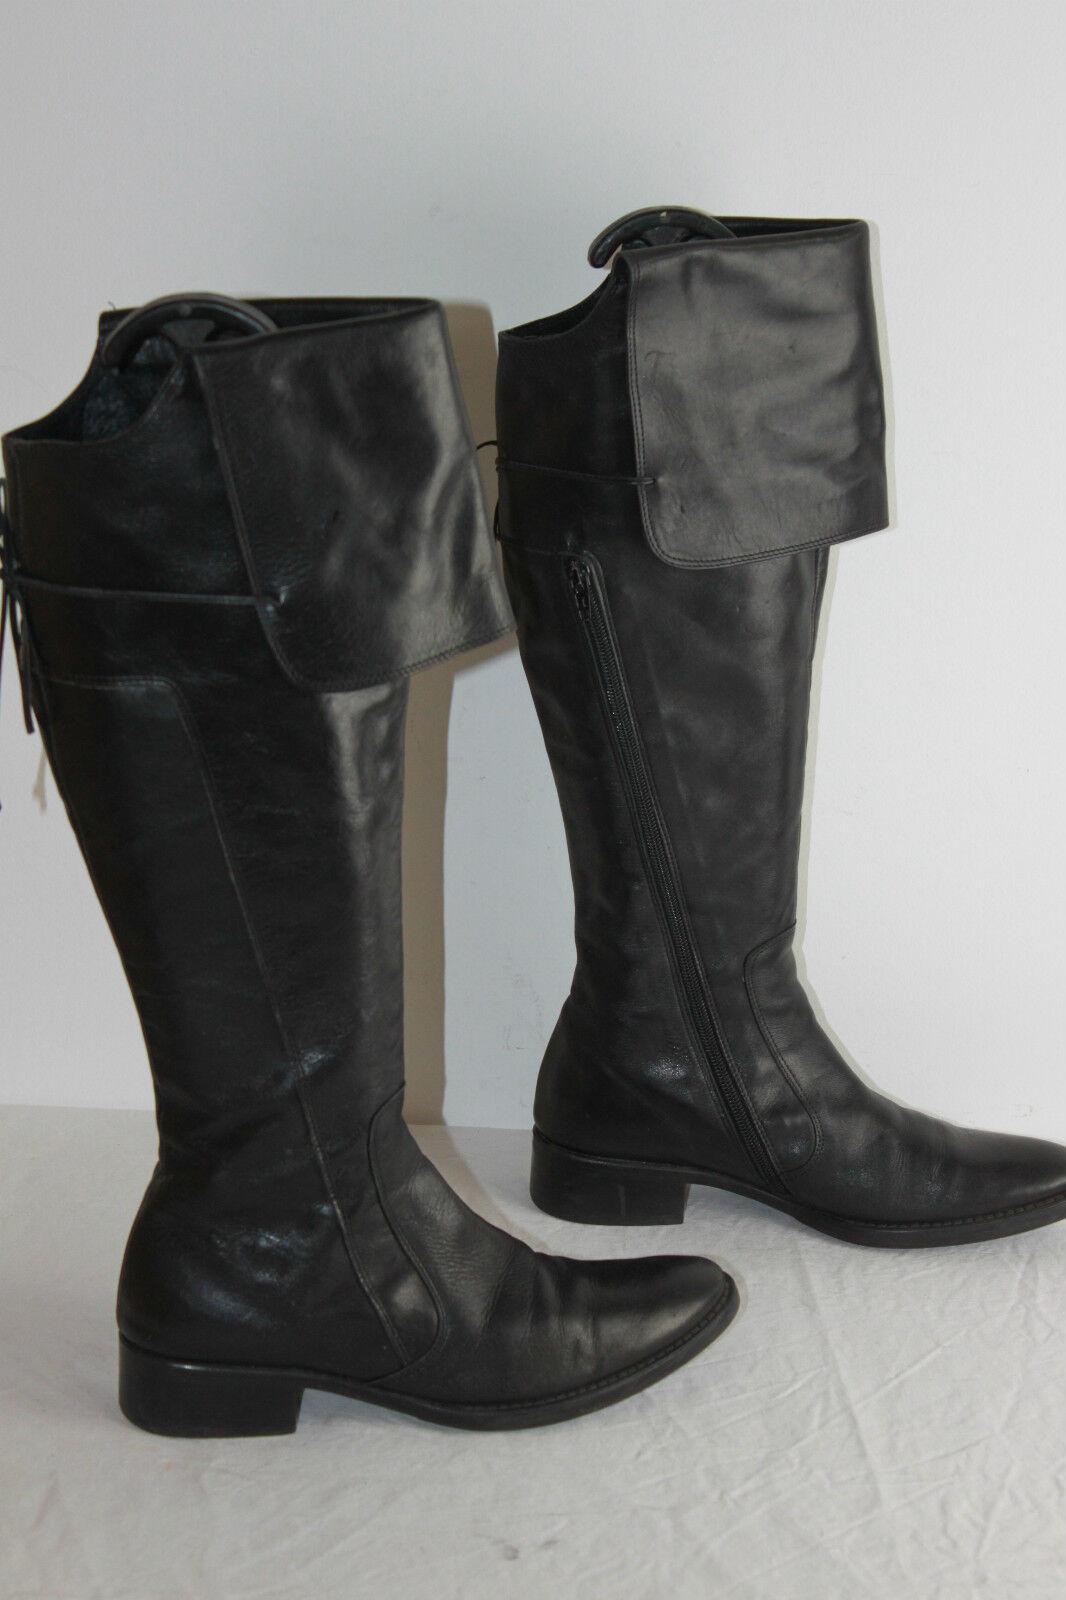 Bottes Genoux BARBARA Cuir black T 37 BE